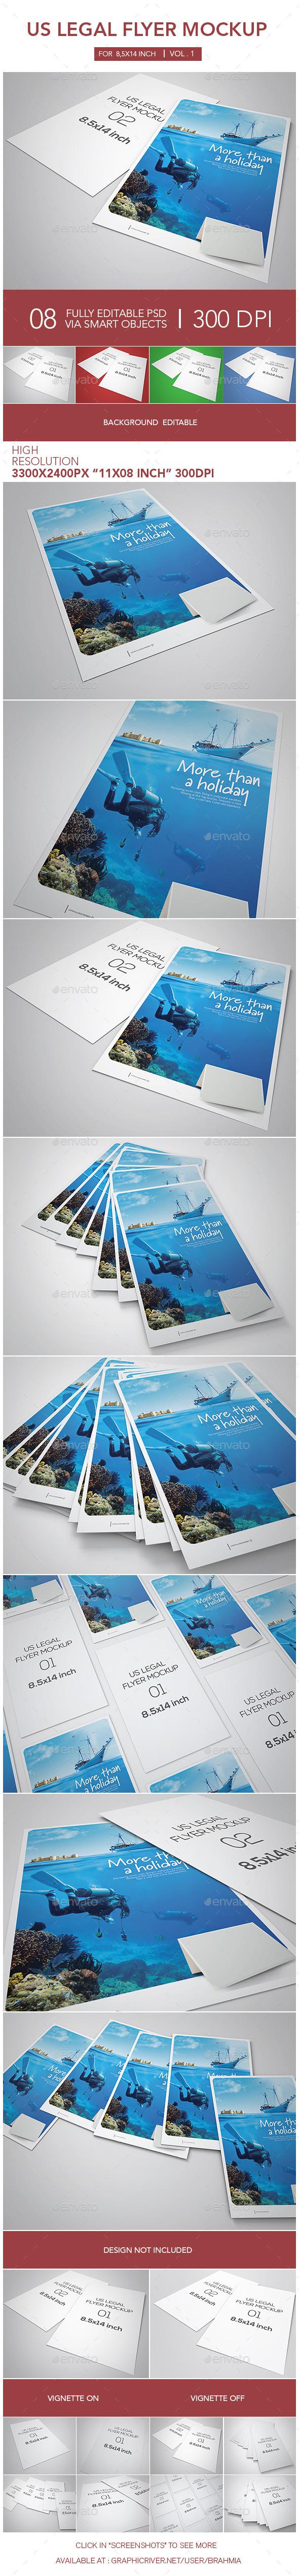 Us Legal Flyer Mockup - Flyers Print